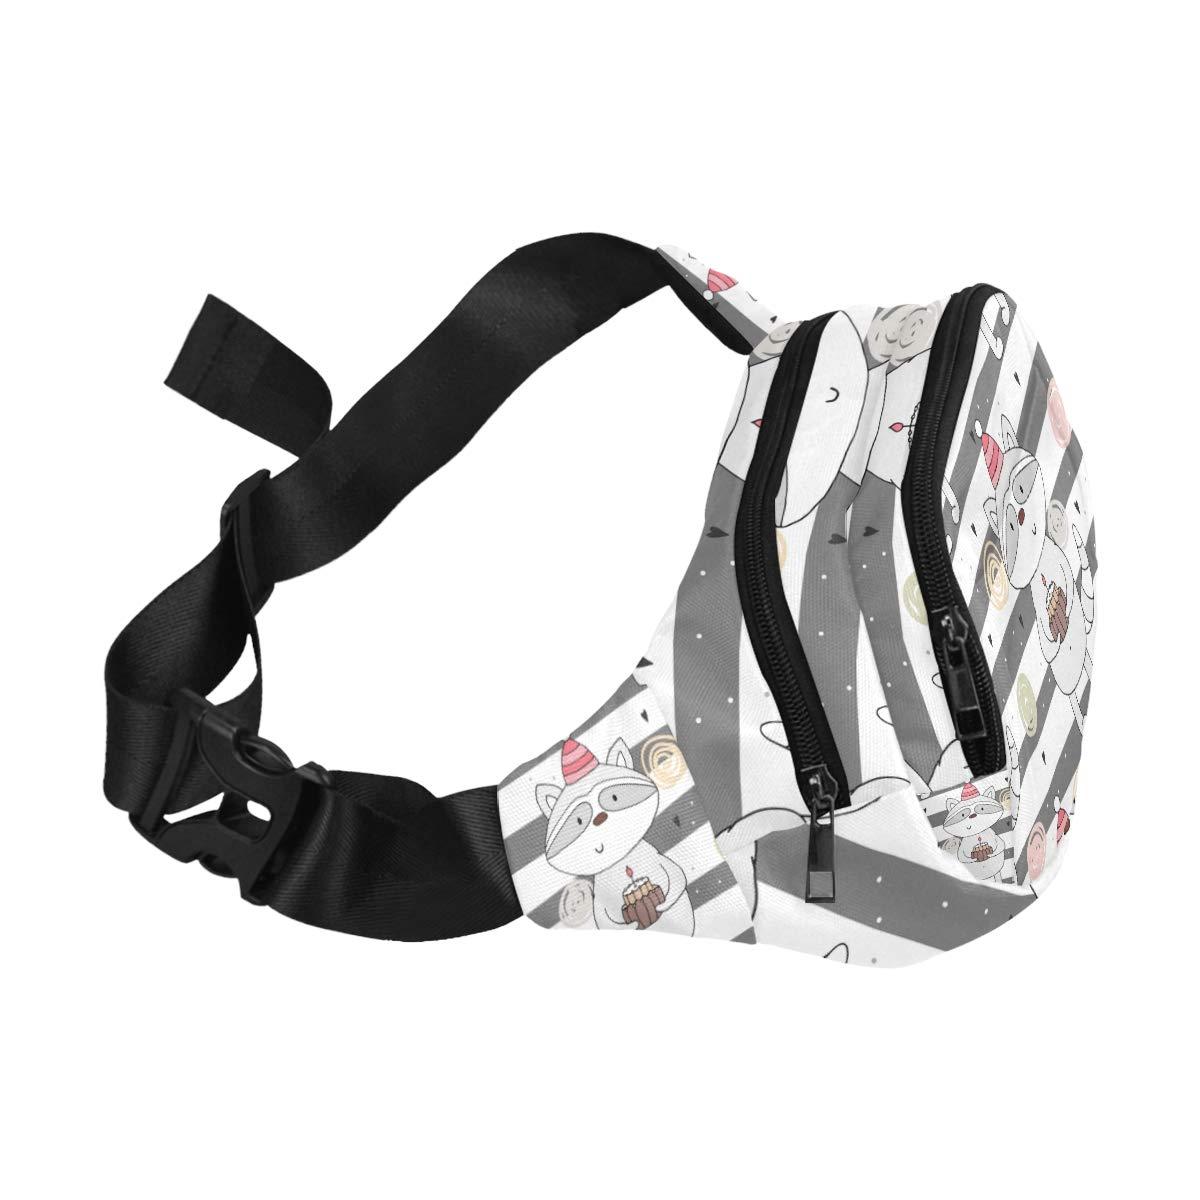 Many Cute Lovely Raccoon Carton Fenny Packs Waist Bags Adjustable Belt Waterproof Nylon Travel Running Sport Vacation Party For Men Women Boys Girls Kids